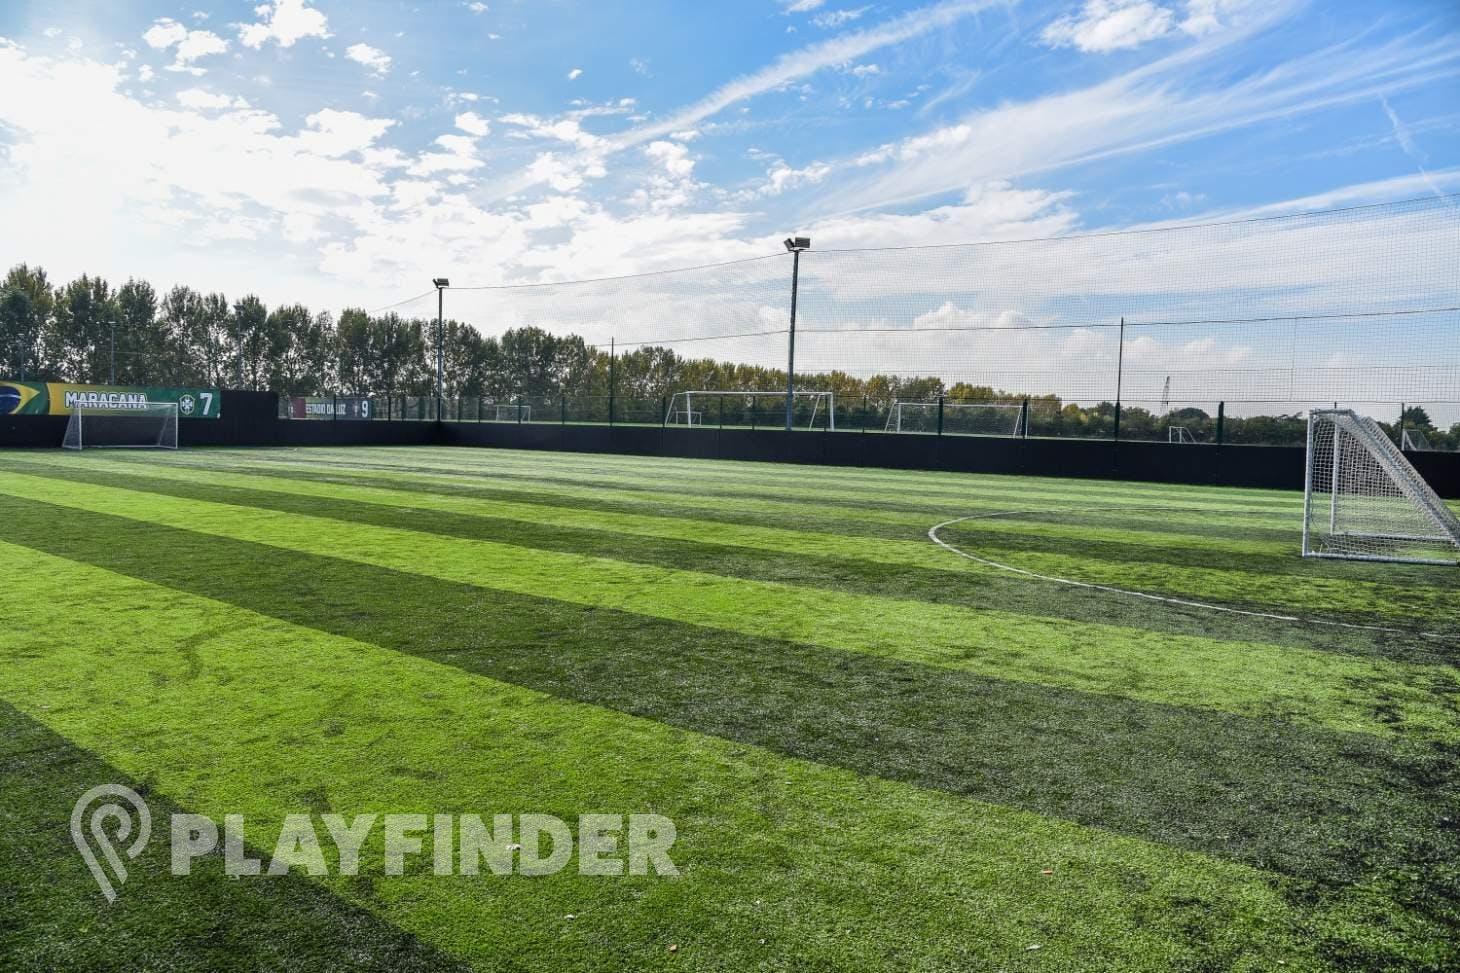 Goals Heathrow 7 a side   3G Astroturf football pitch